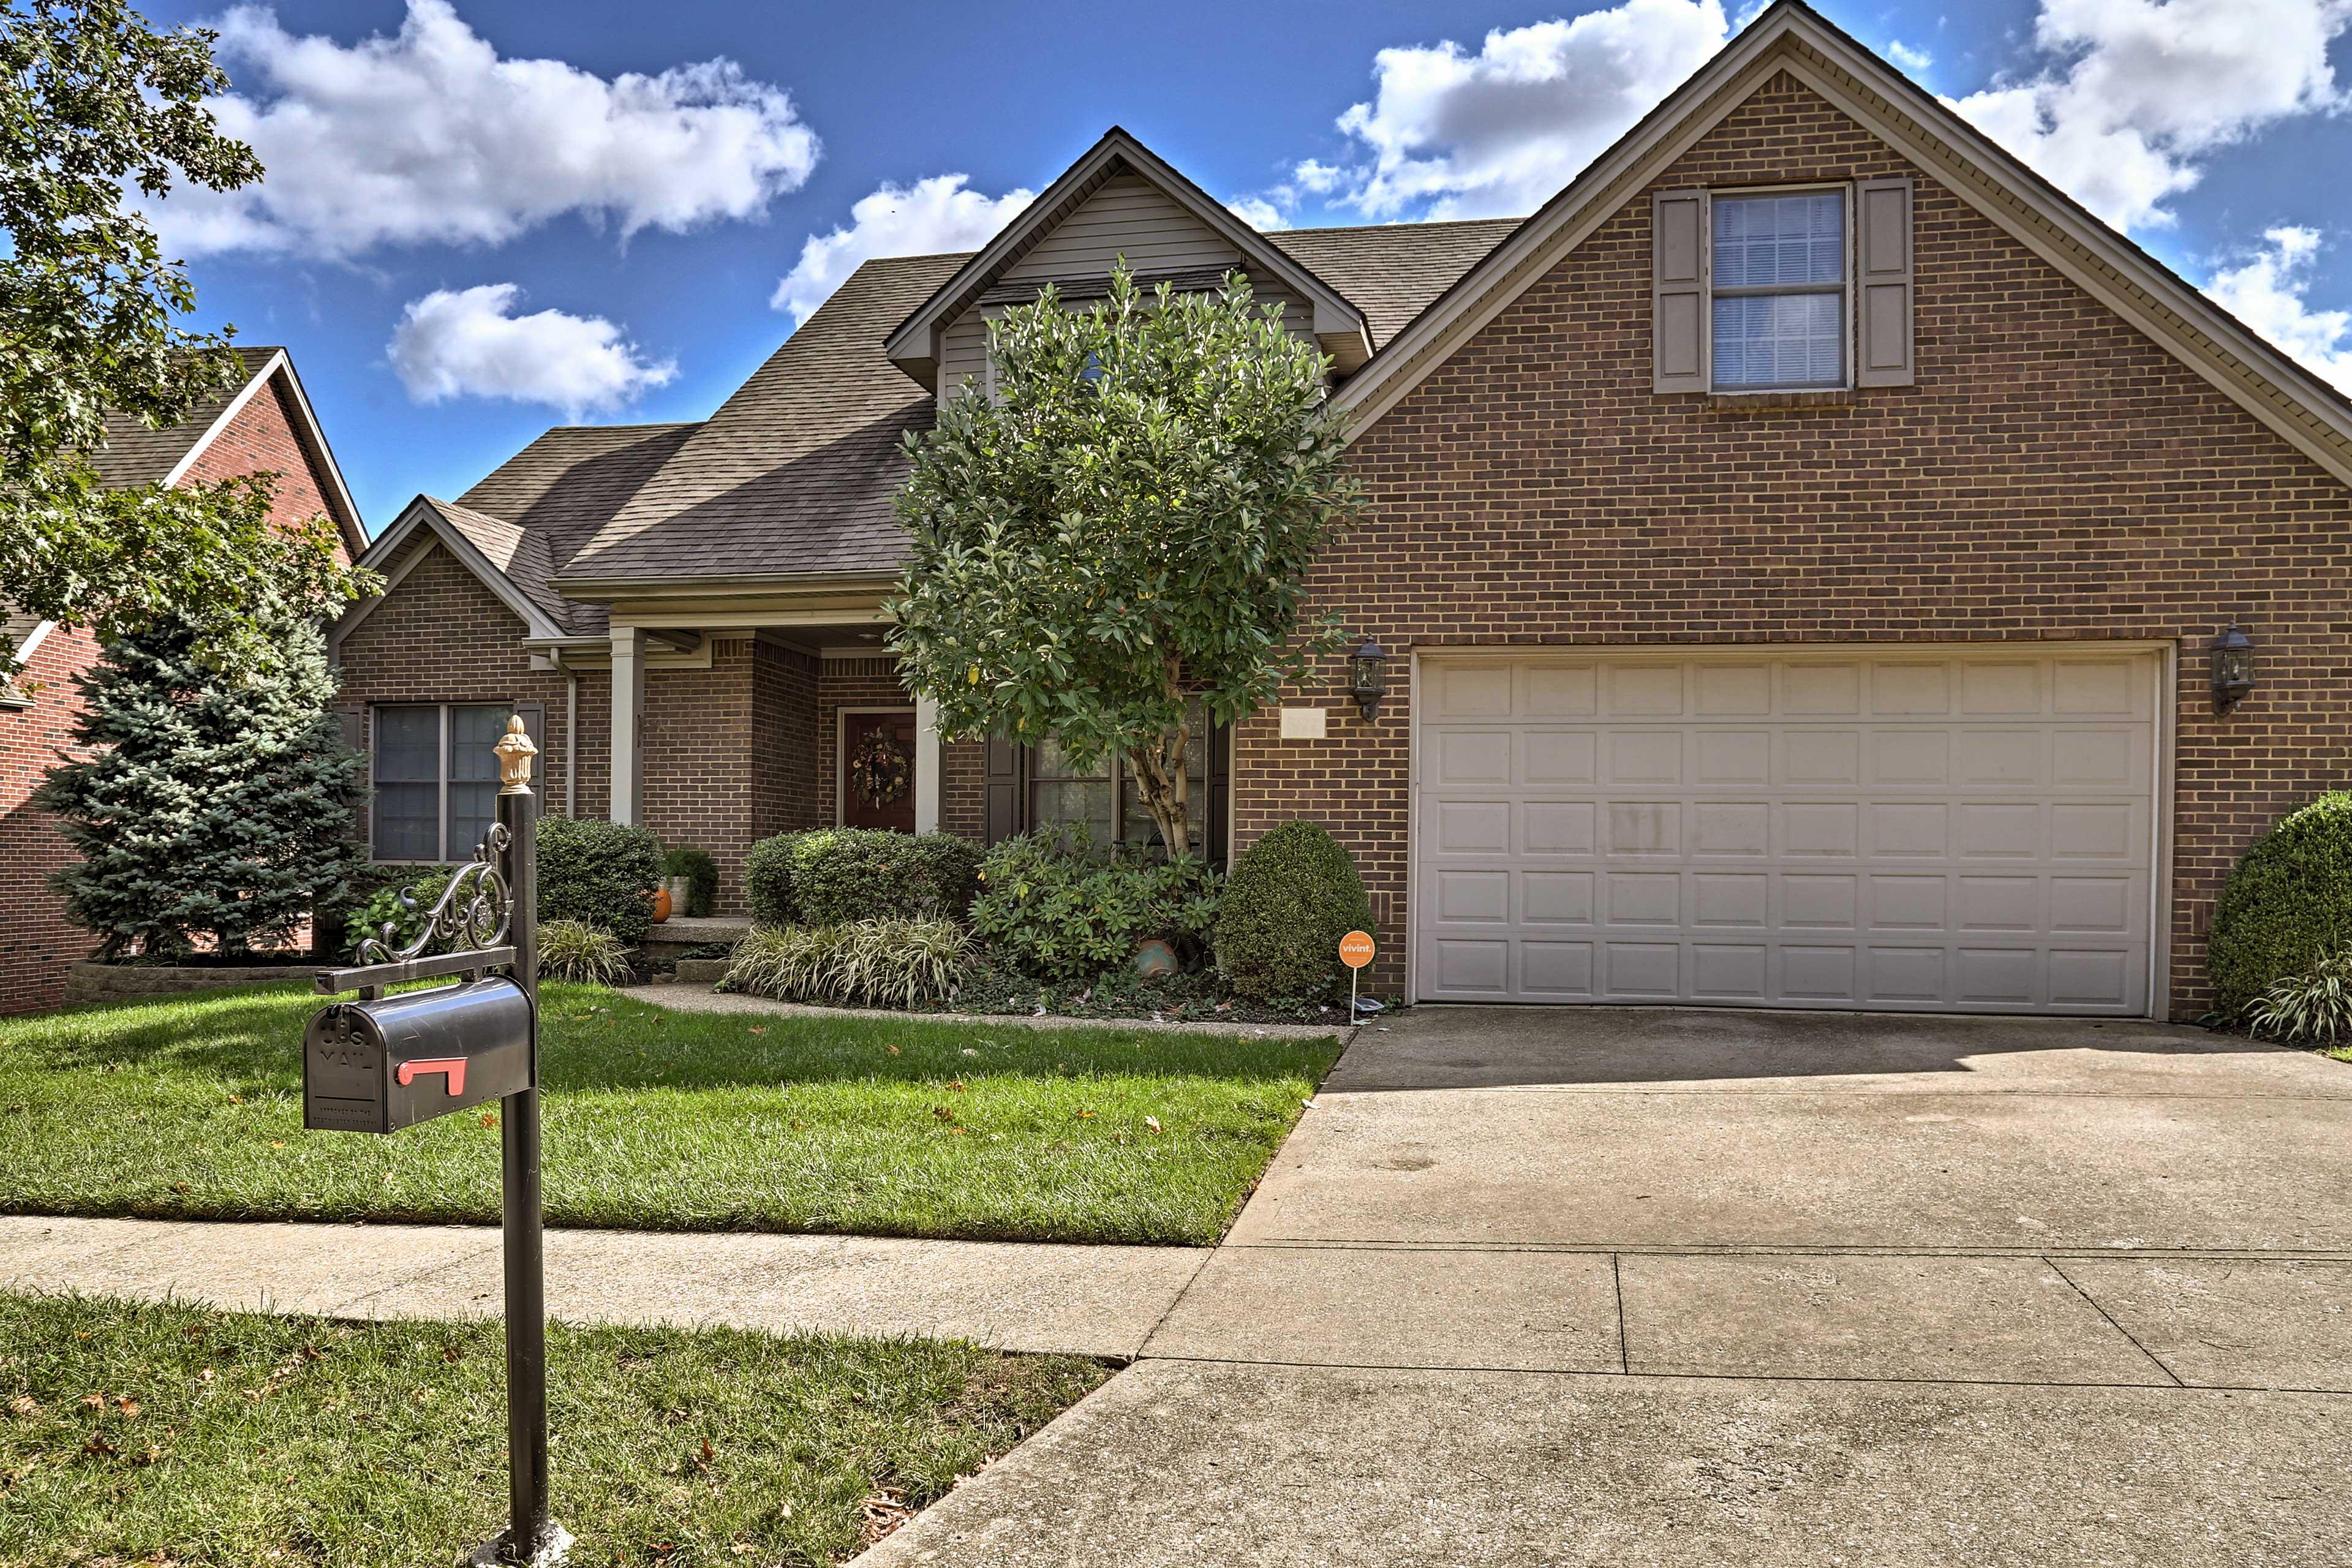 Easy living awaits at this gorgeous Lexington home.